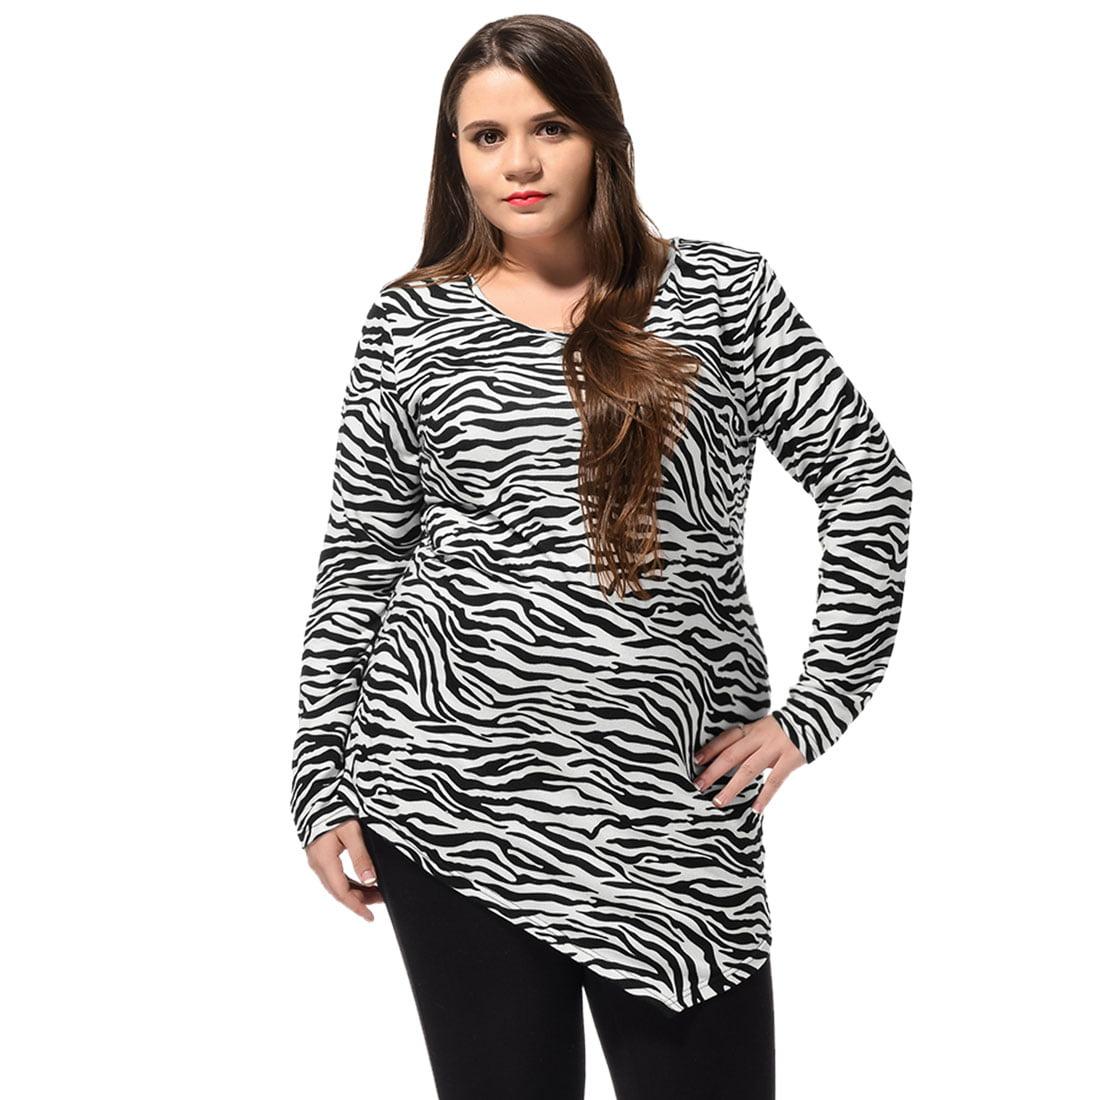 Unique Bargains Women's Plus Size Zebra Print Irregular Hem Long Sleeves Tunic Top Off-White (Size 3X)